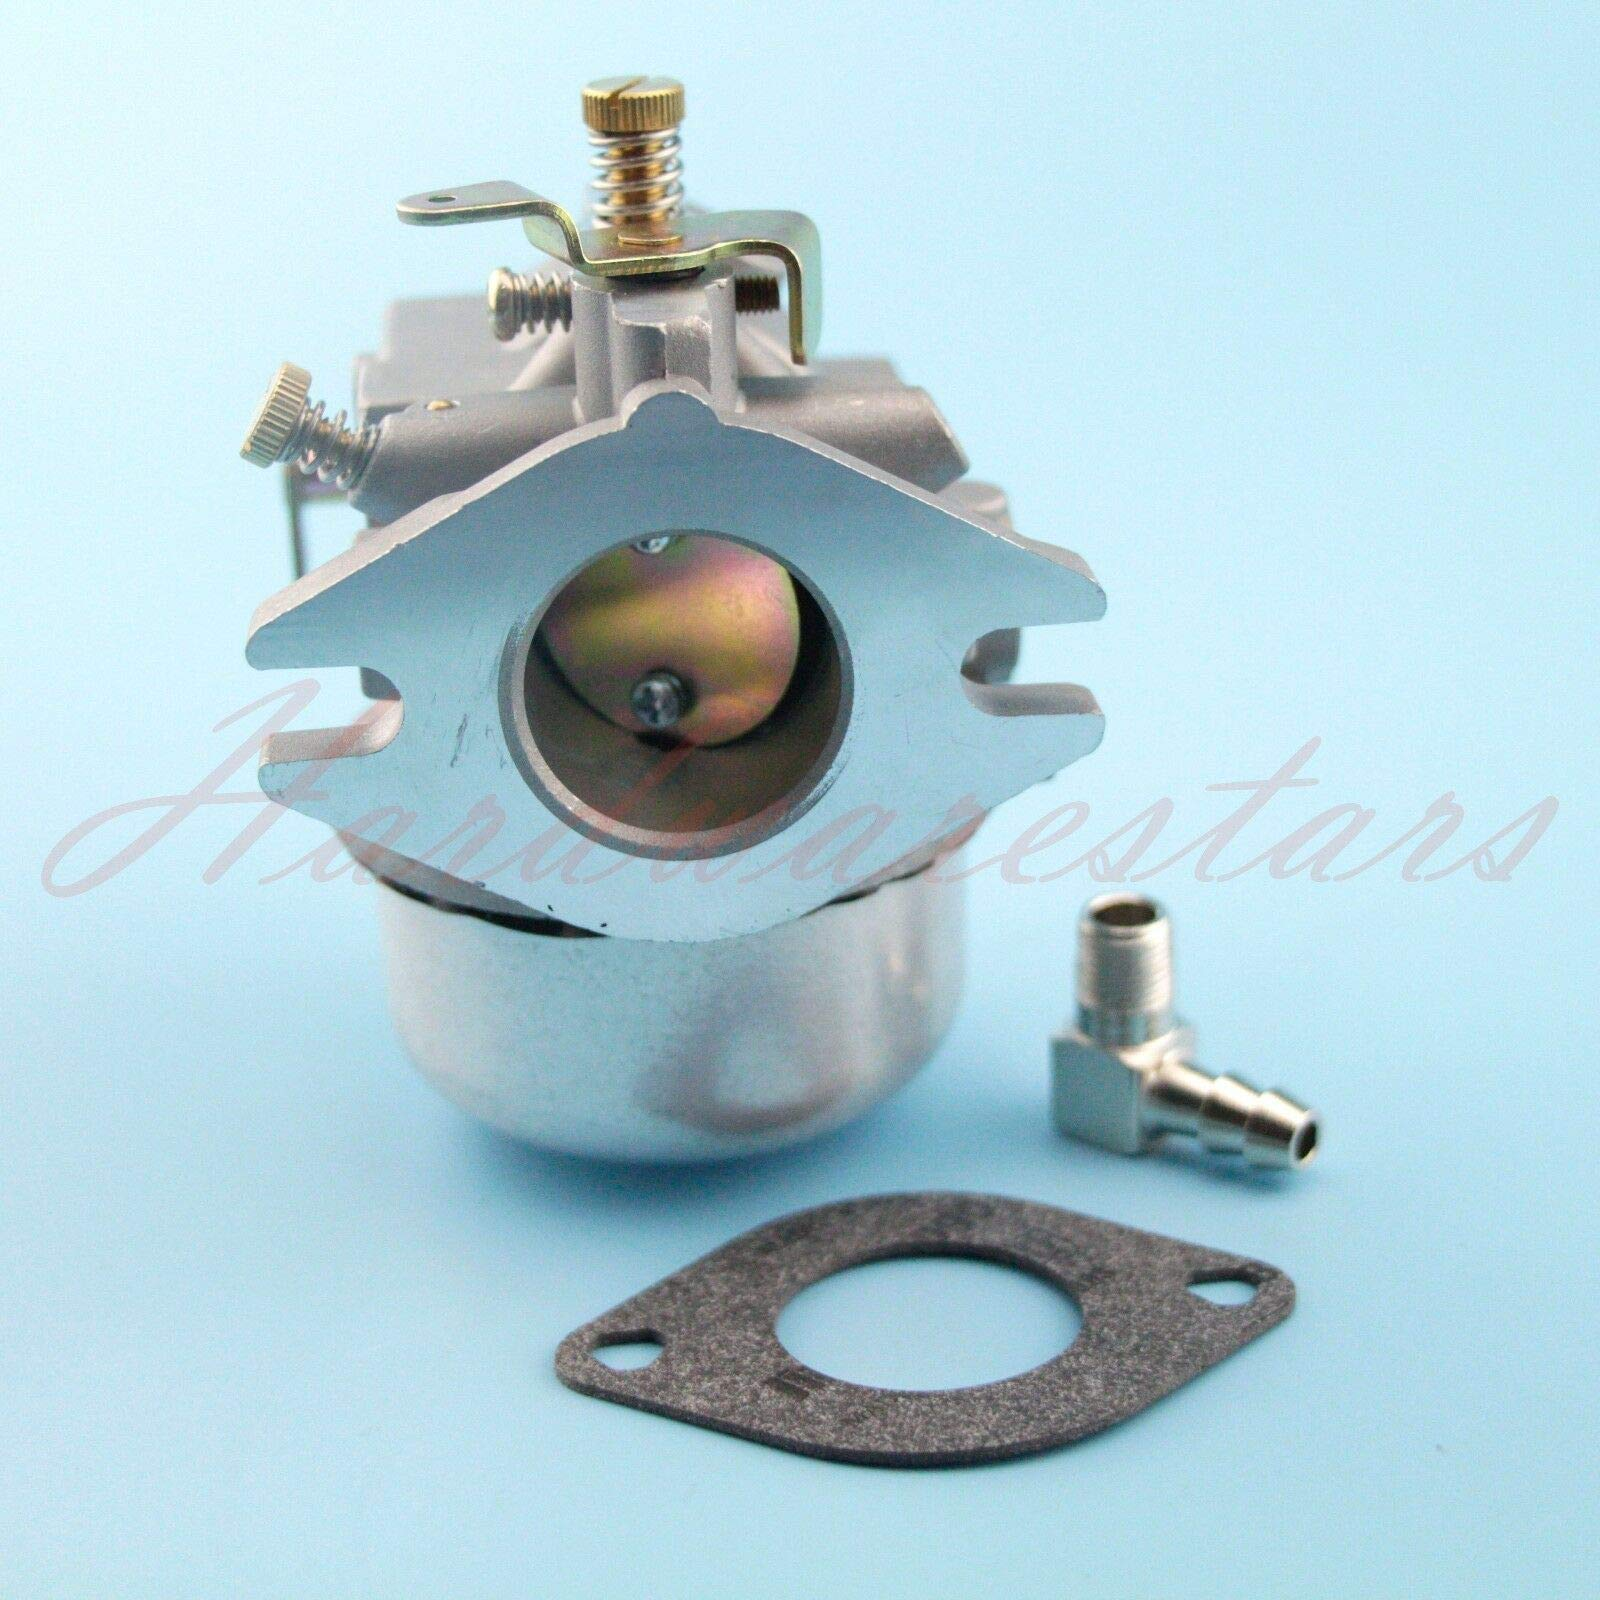 FidgetKute Carburetor for Kohler Magnum KT17 KT18 KT19 M18 M20 MV18 MV20 Sears Craftsman by FidgetKute